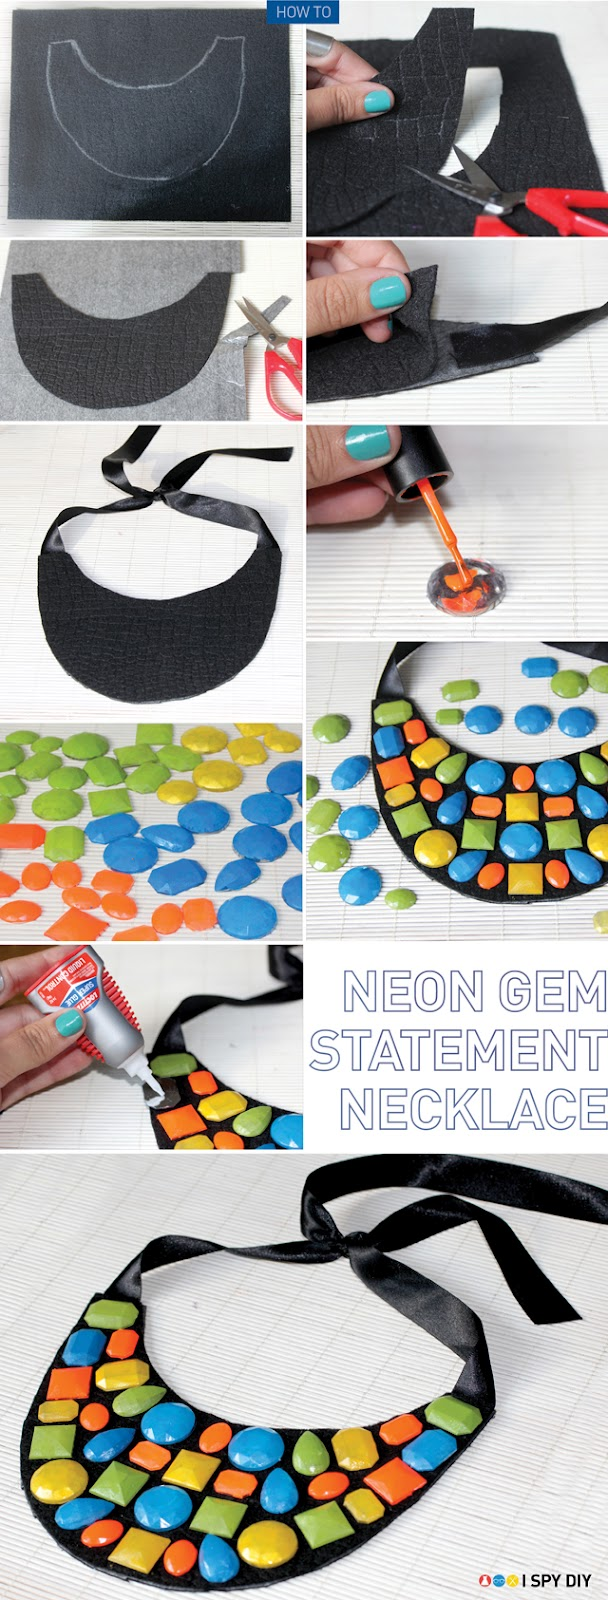 15 Diy Jewelry Craft Tutorials Homemade Jewelry Ideas Pretty Designs